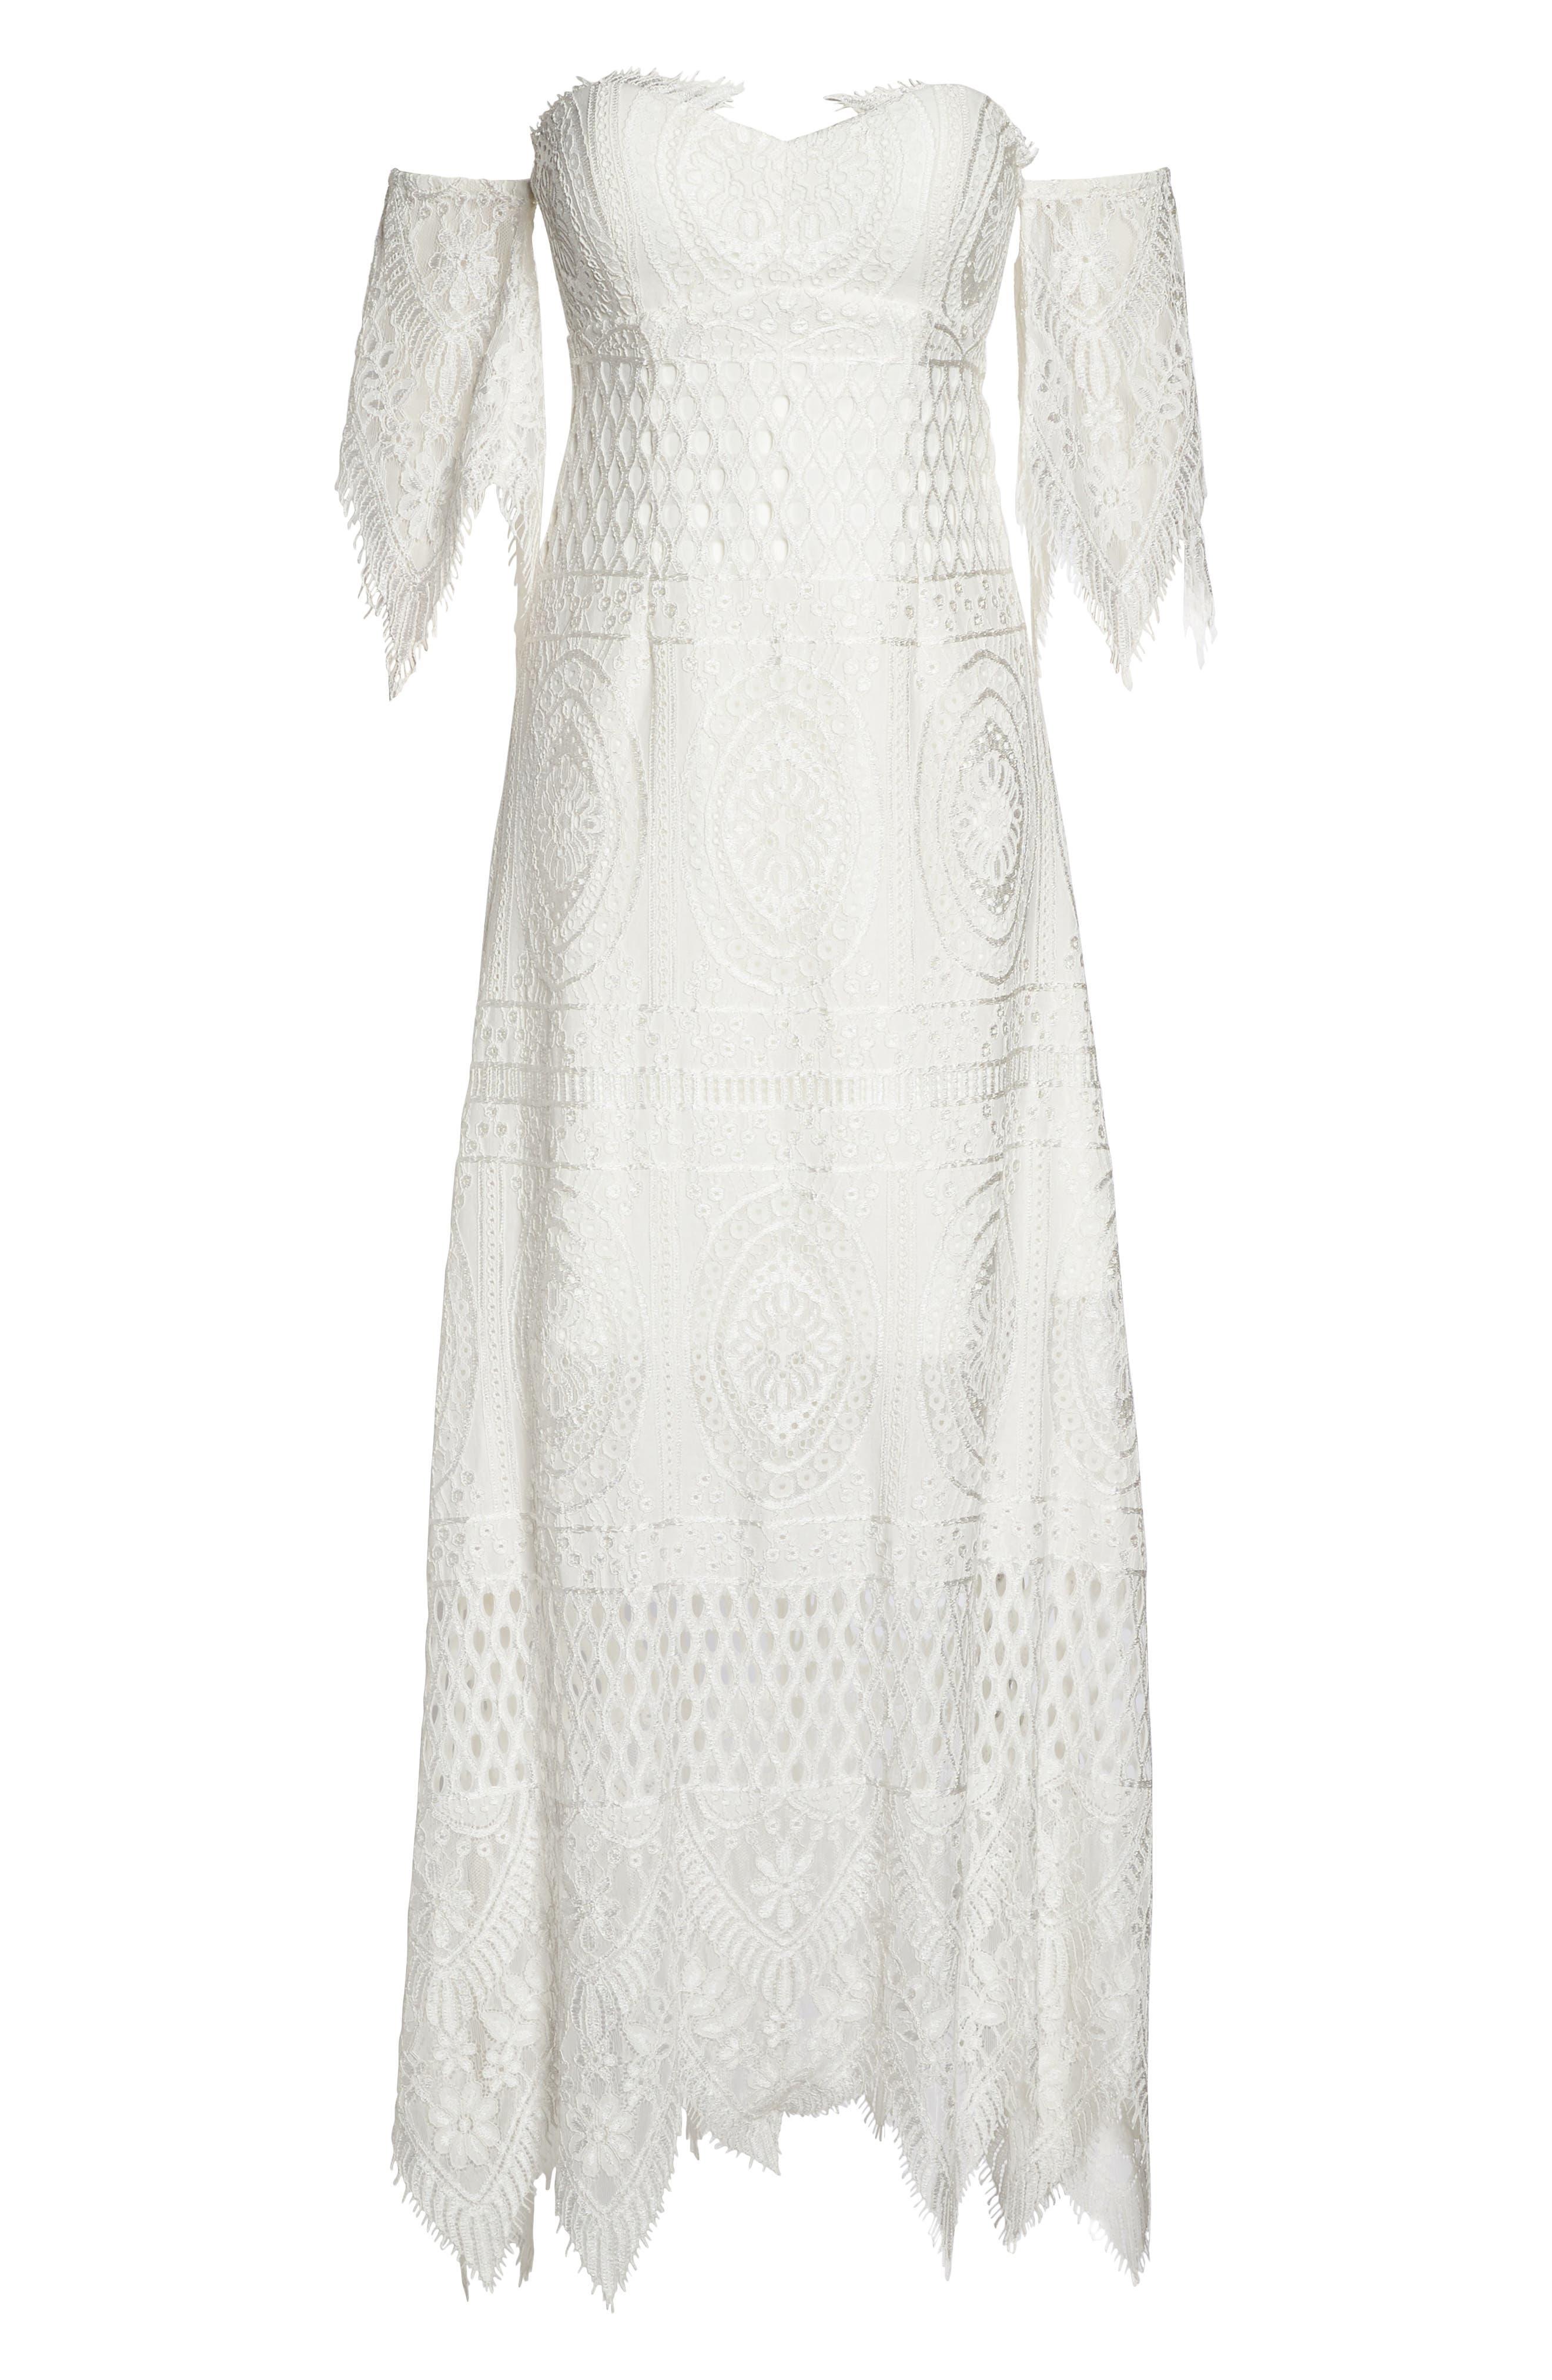 Lace Off the Shoulder Maxi Dress,                             Alternate thumbnail 6, color,                             900